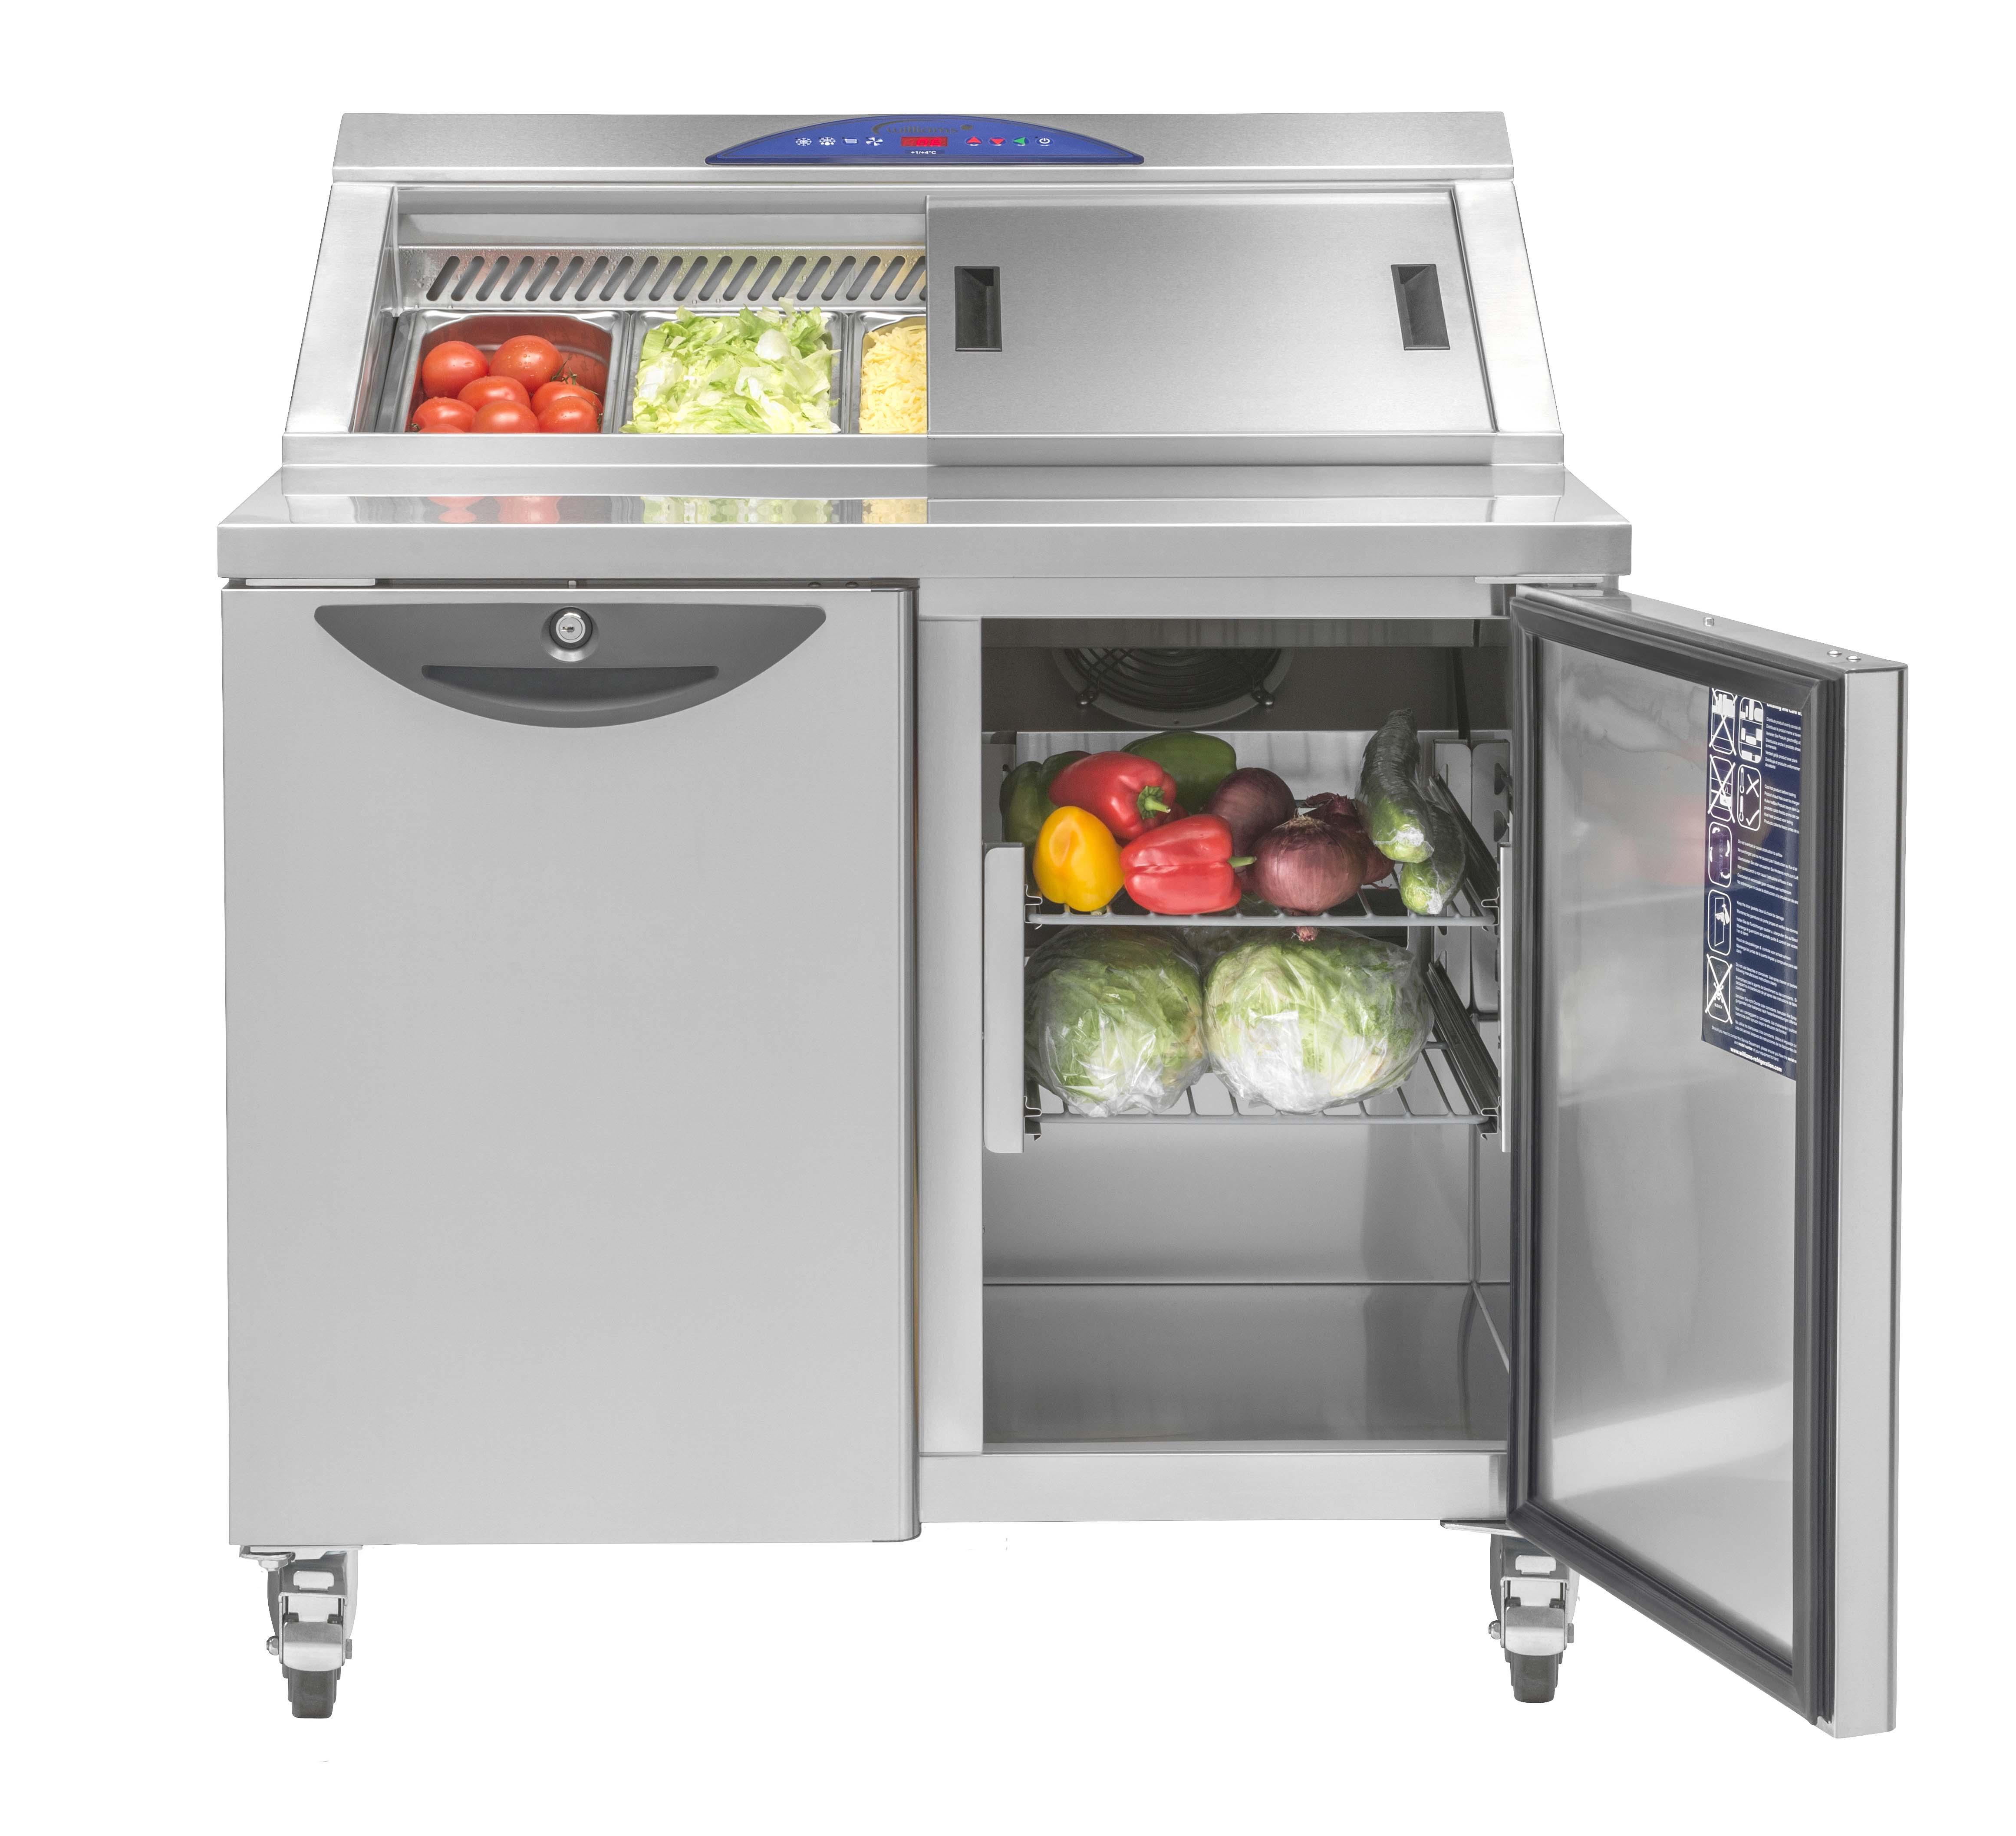 Energy Efficient Kitchen Appliances Williams New Onyx Cpc2 Is The Practical Energy Efficient Solution